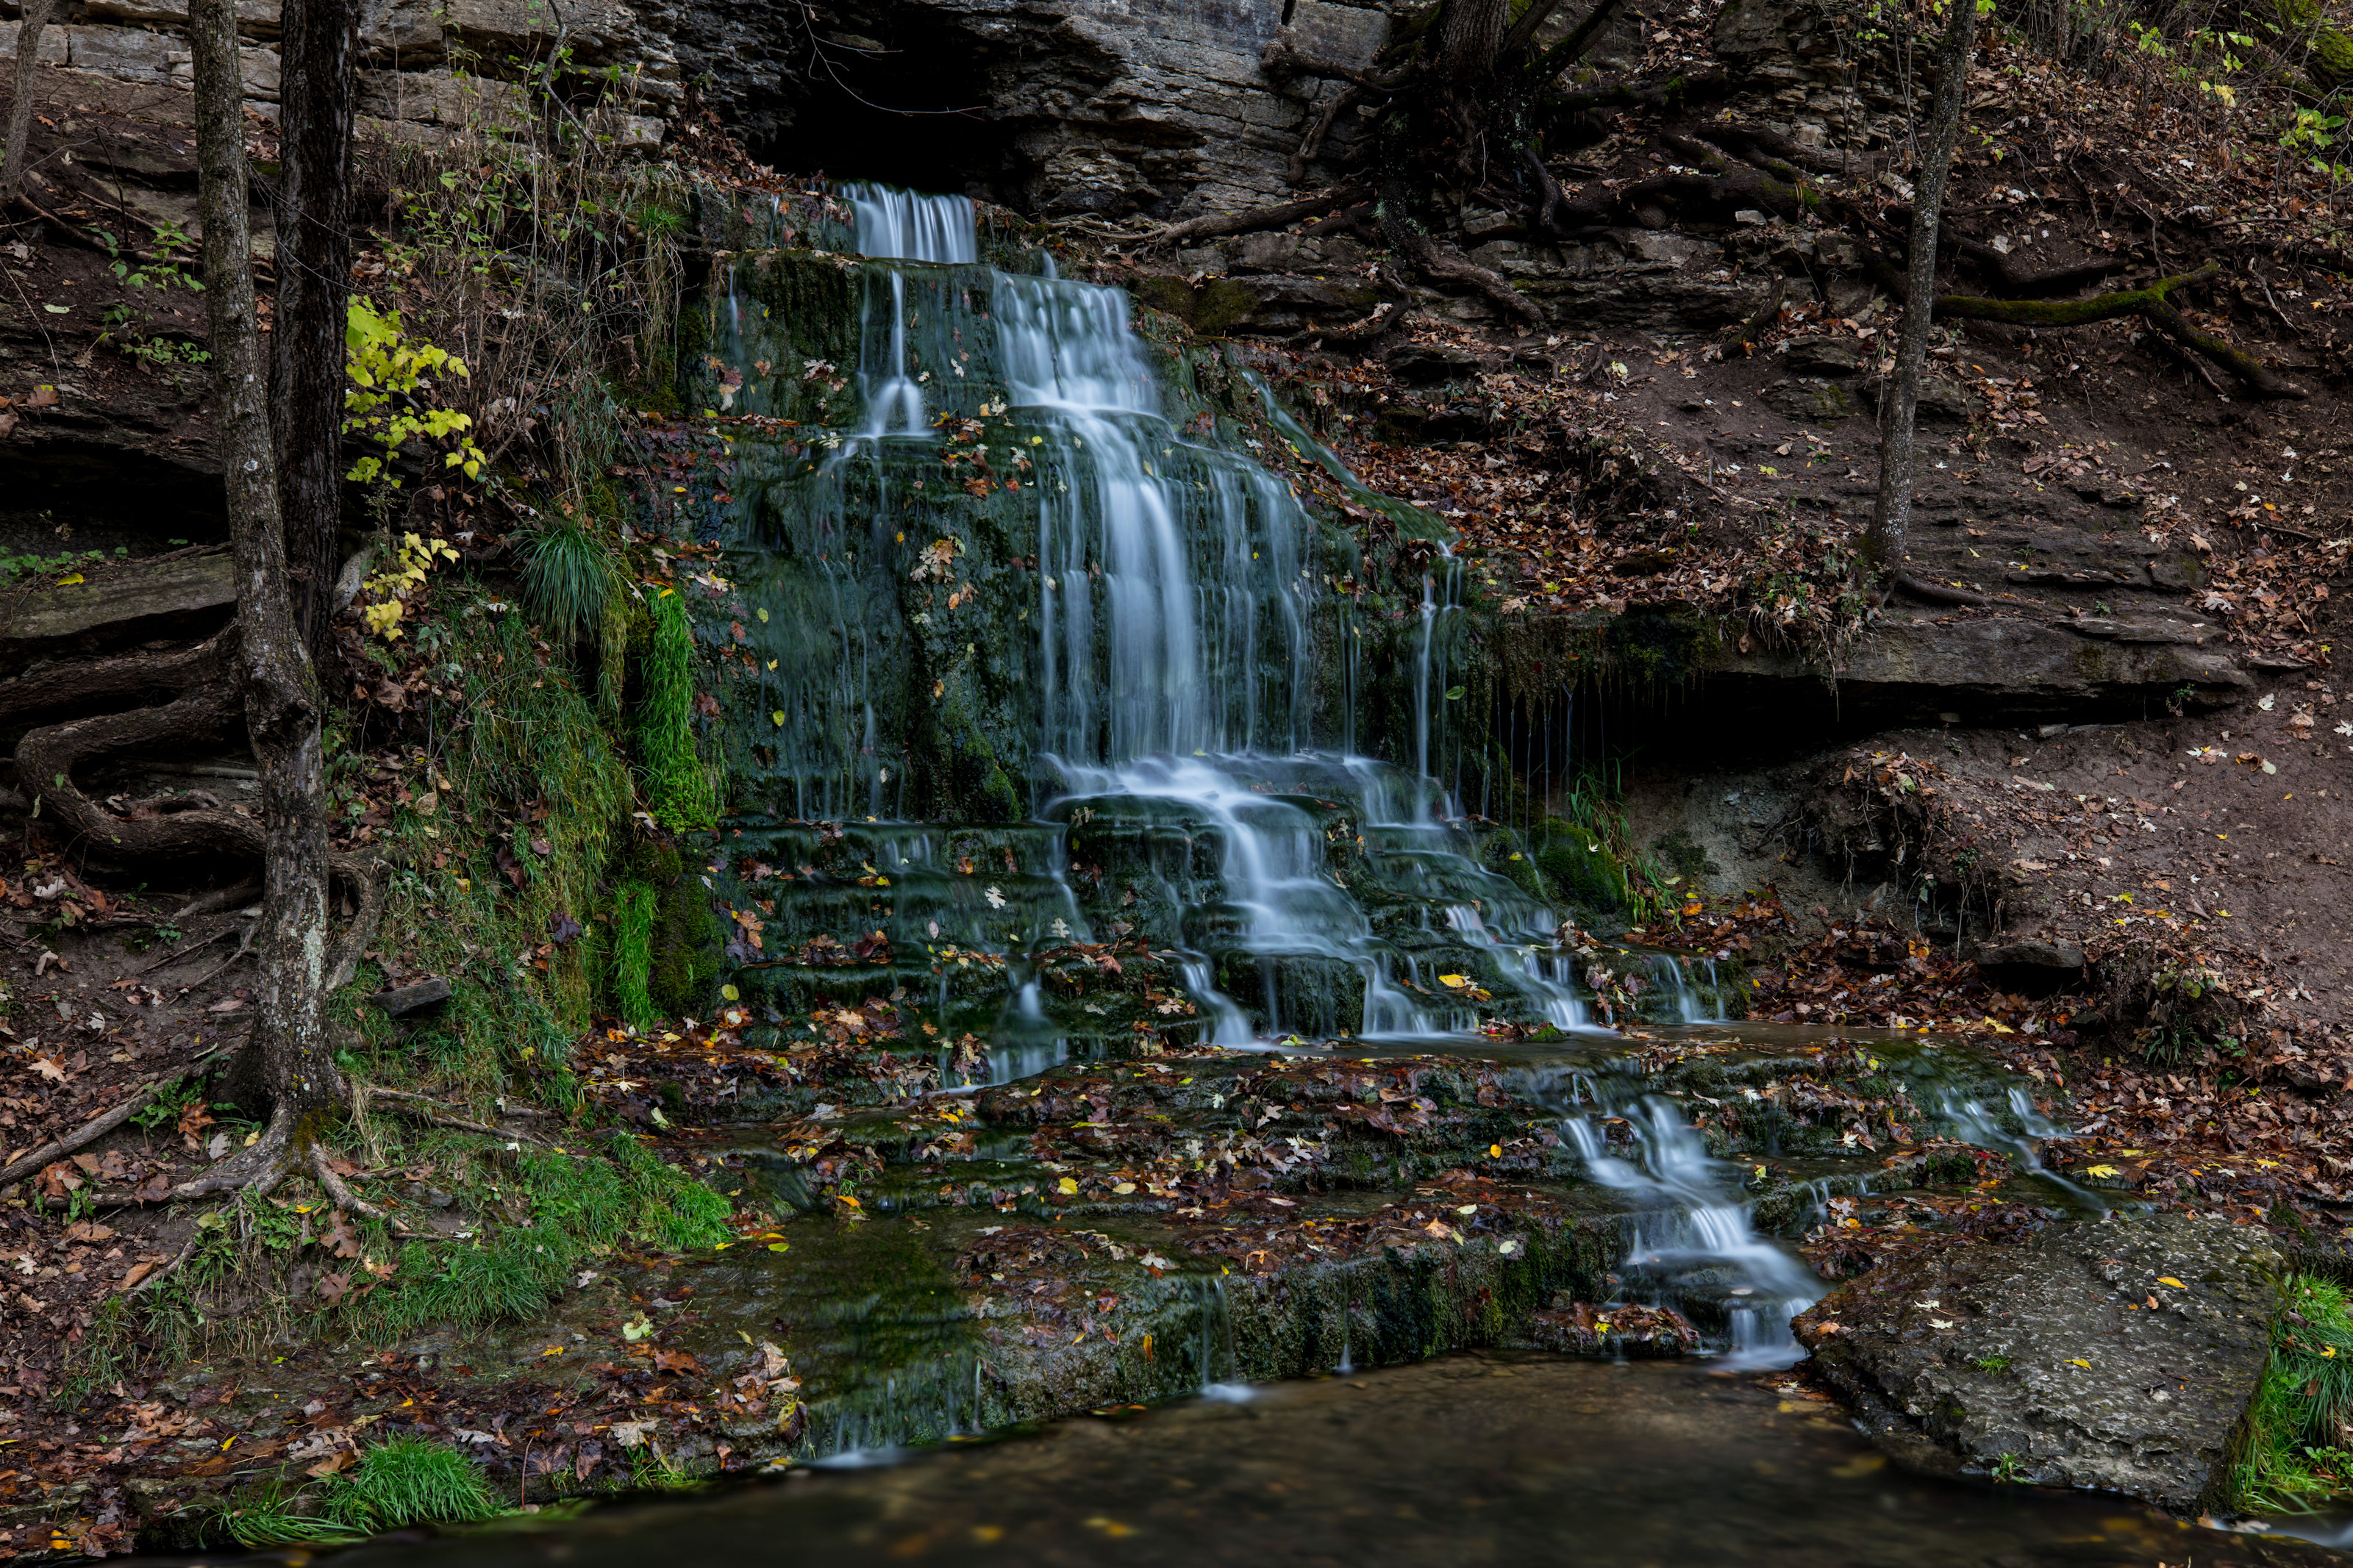 Beulah Falls 10-22-17 - Canon.jpg